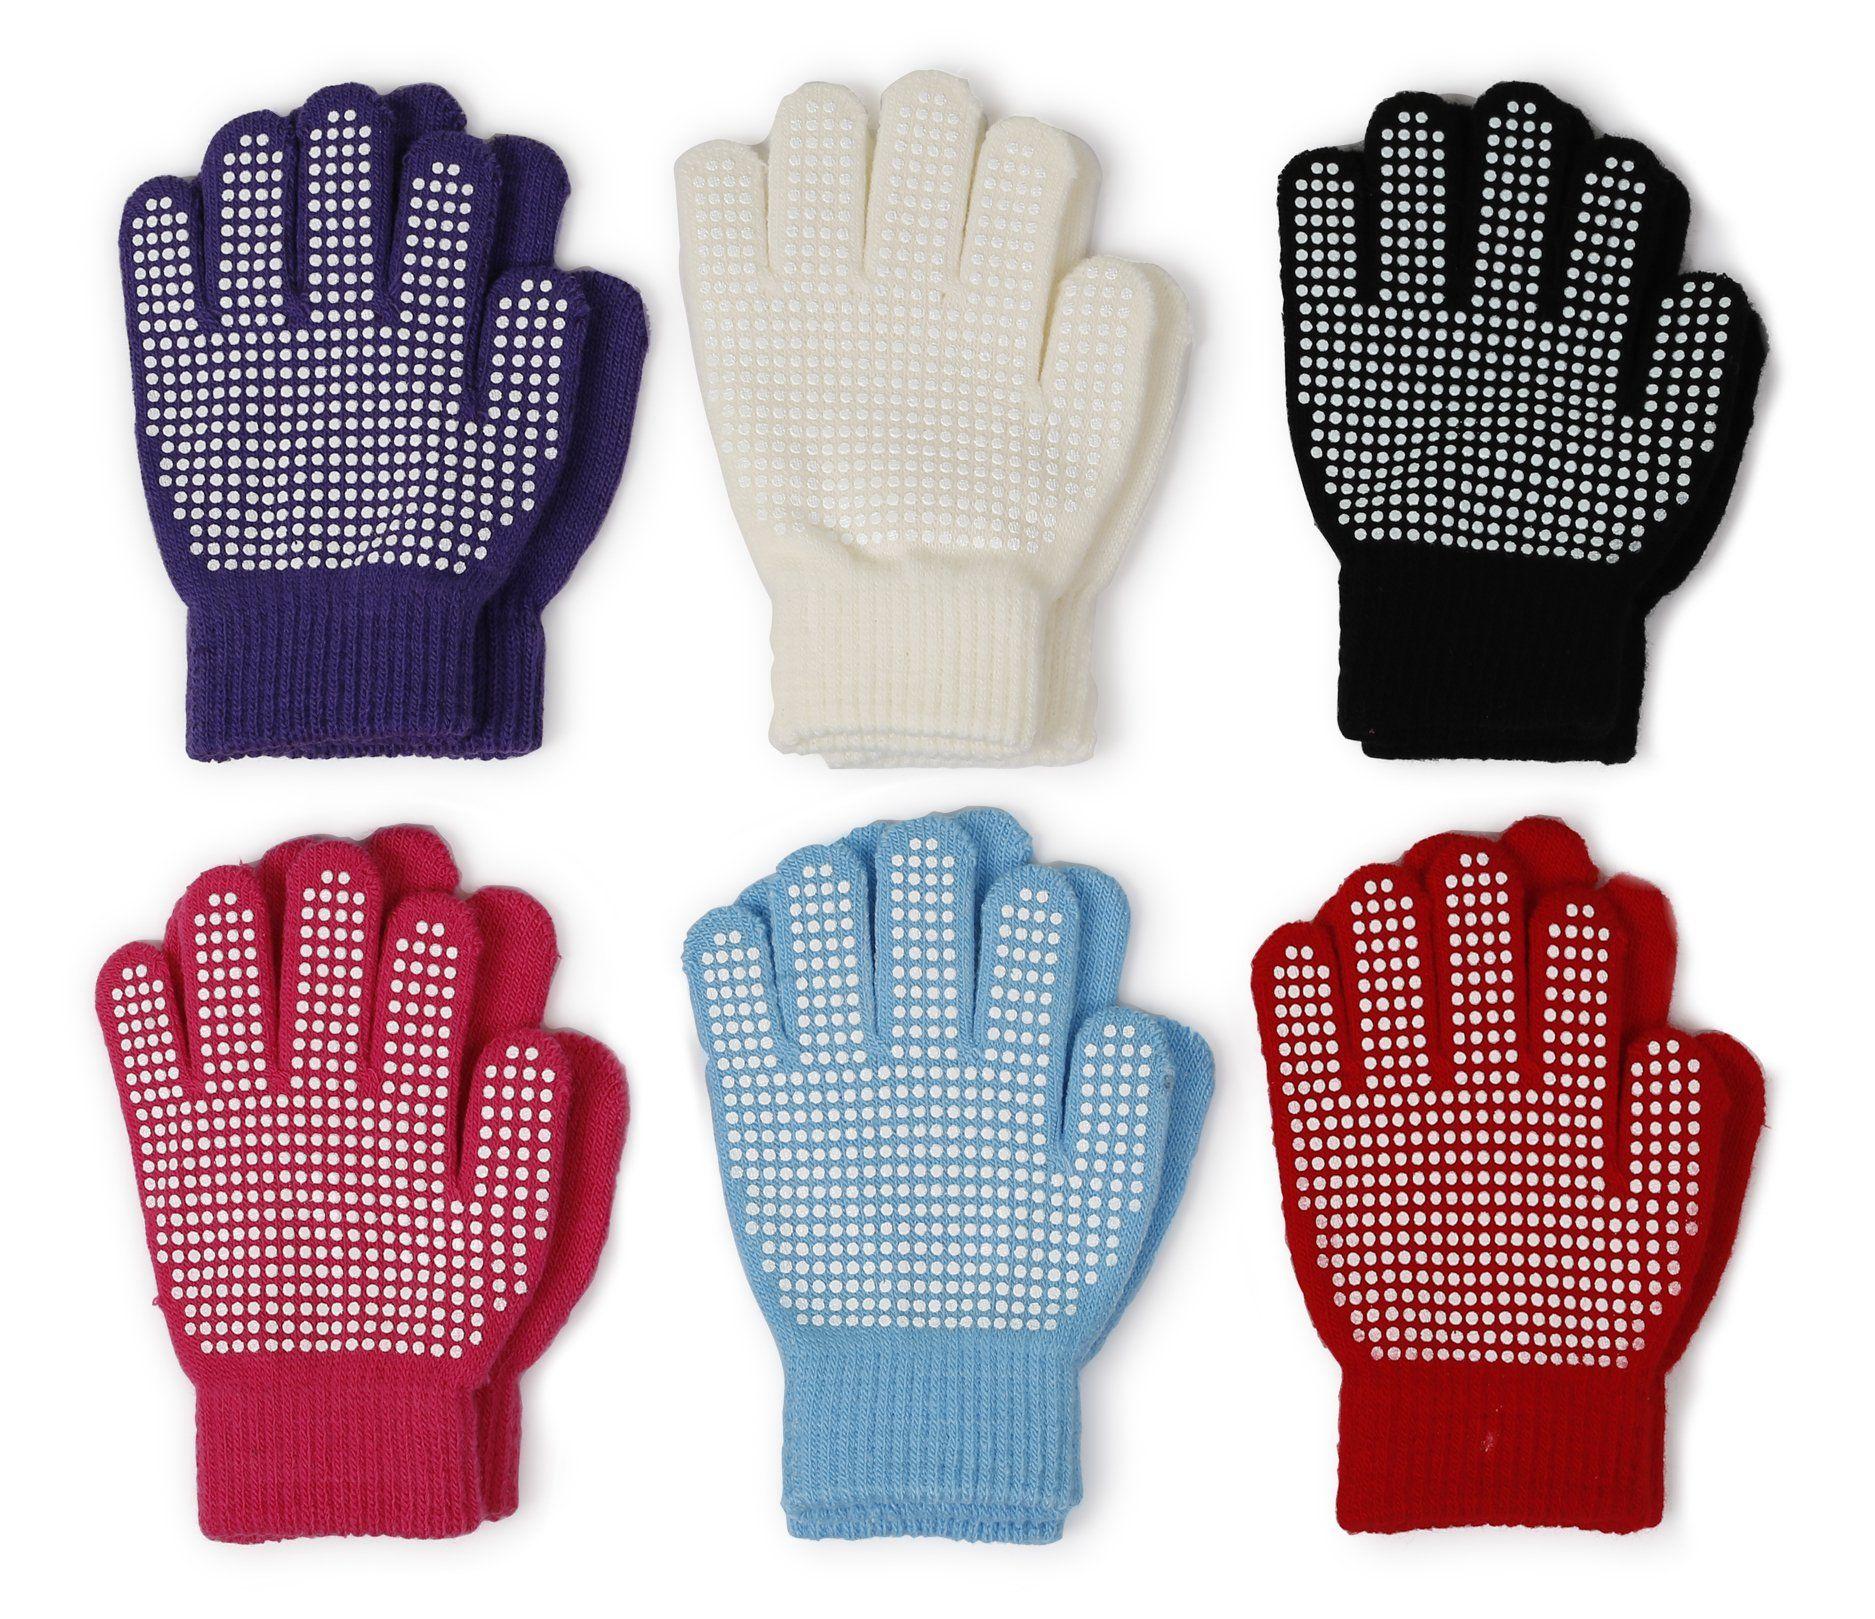 New Winter Warm Magic-Stretch Gripper Glove Kids Size Colorful Set Knit Gloves